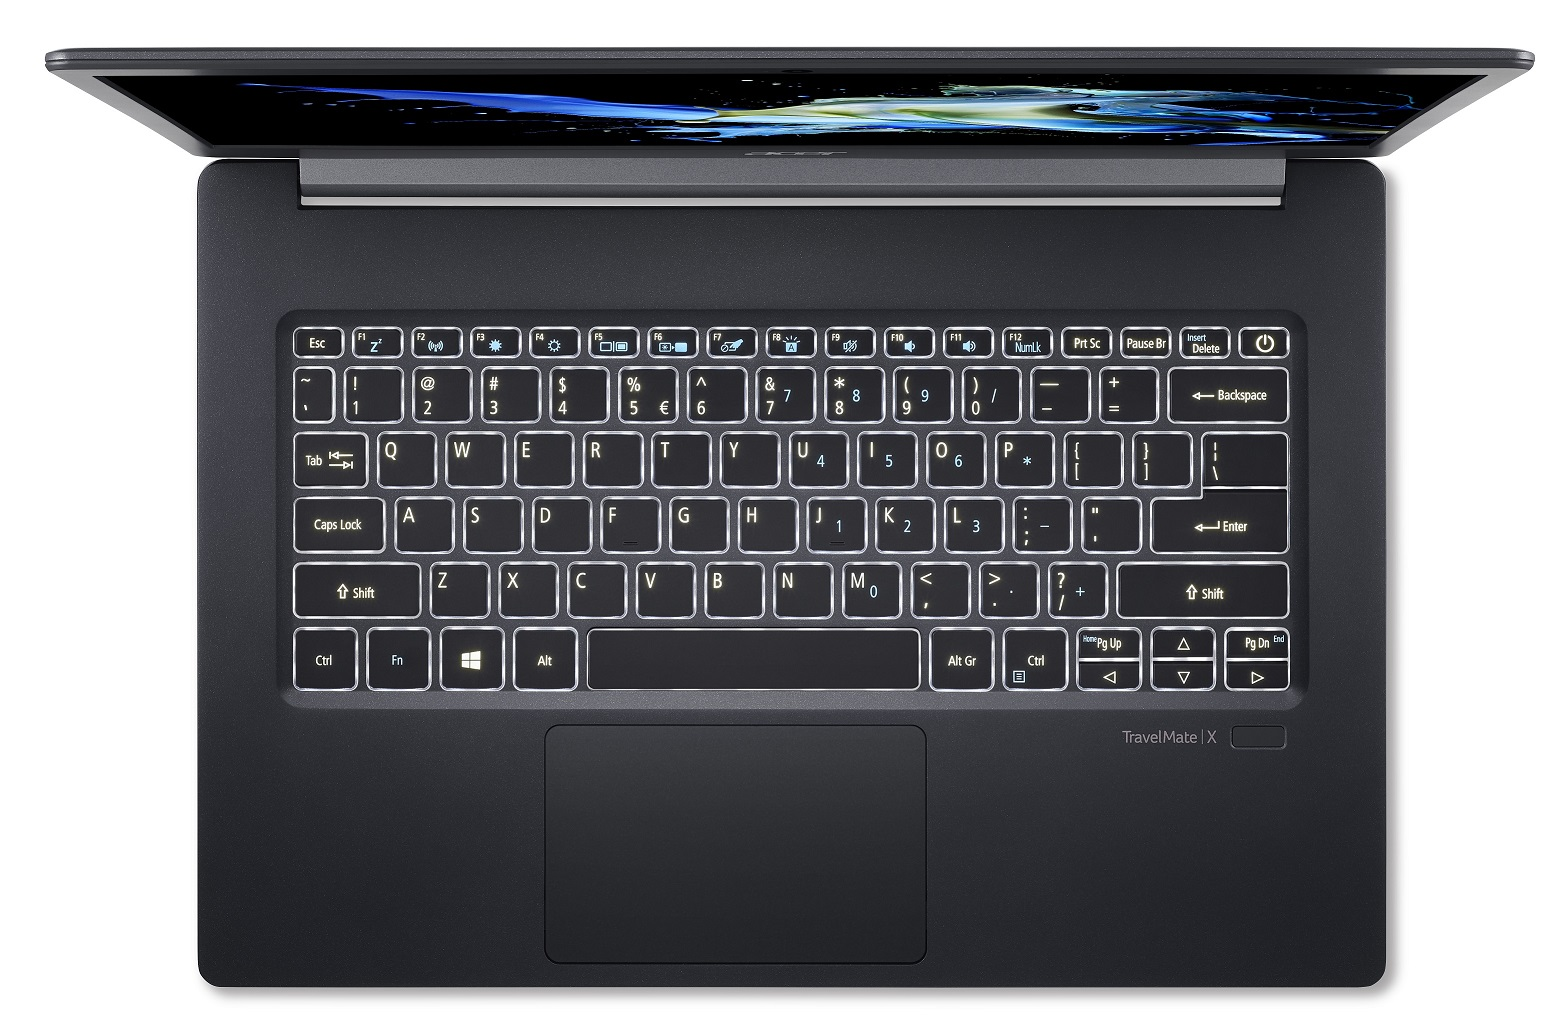 Acer 小於 1 公斤筆電再一款,TravelMate X5 重量 980 公克、售價 37,900 元起